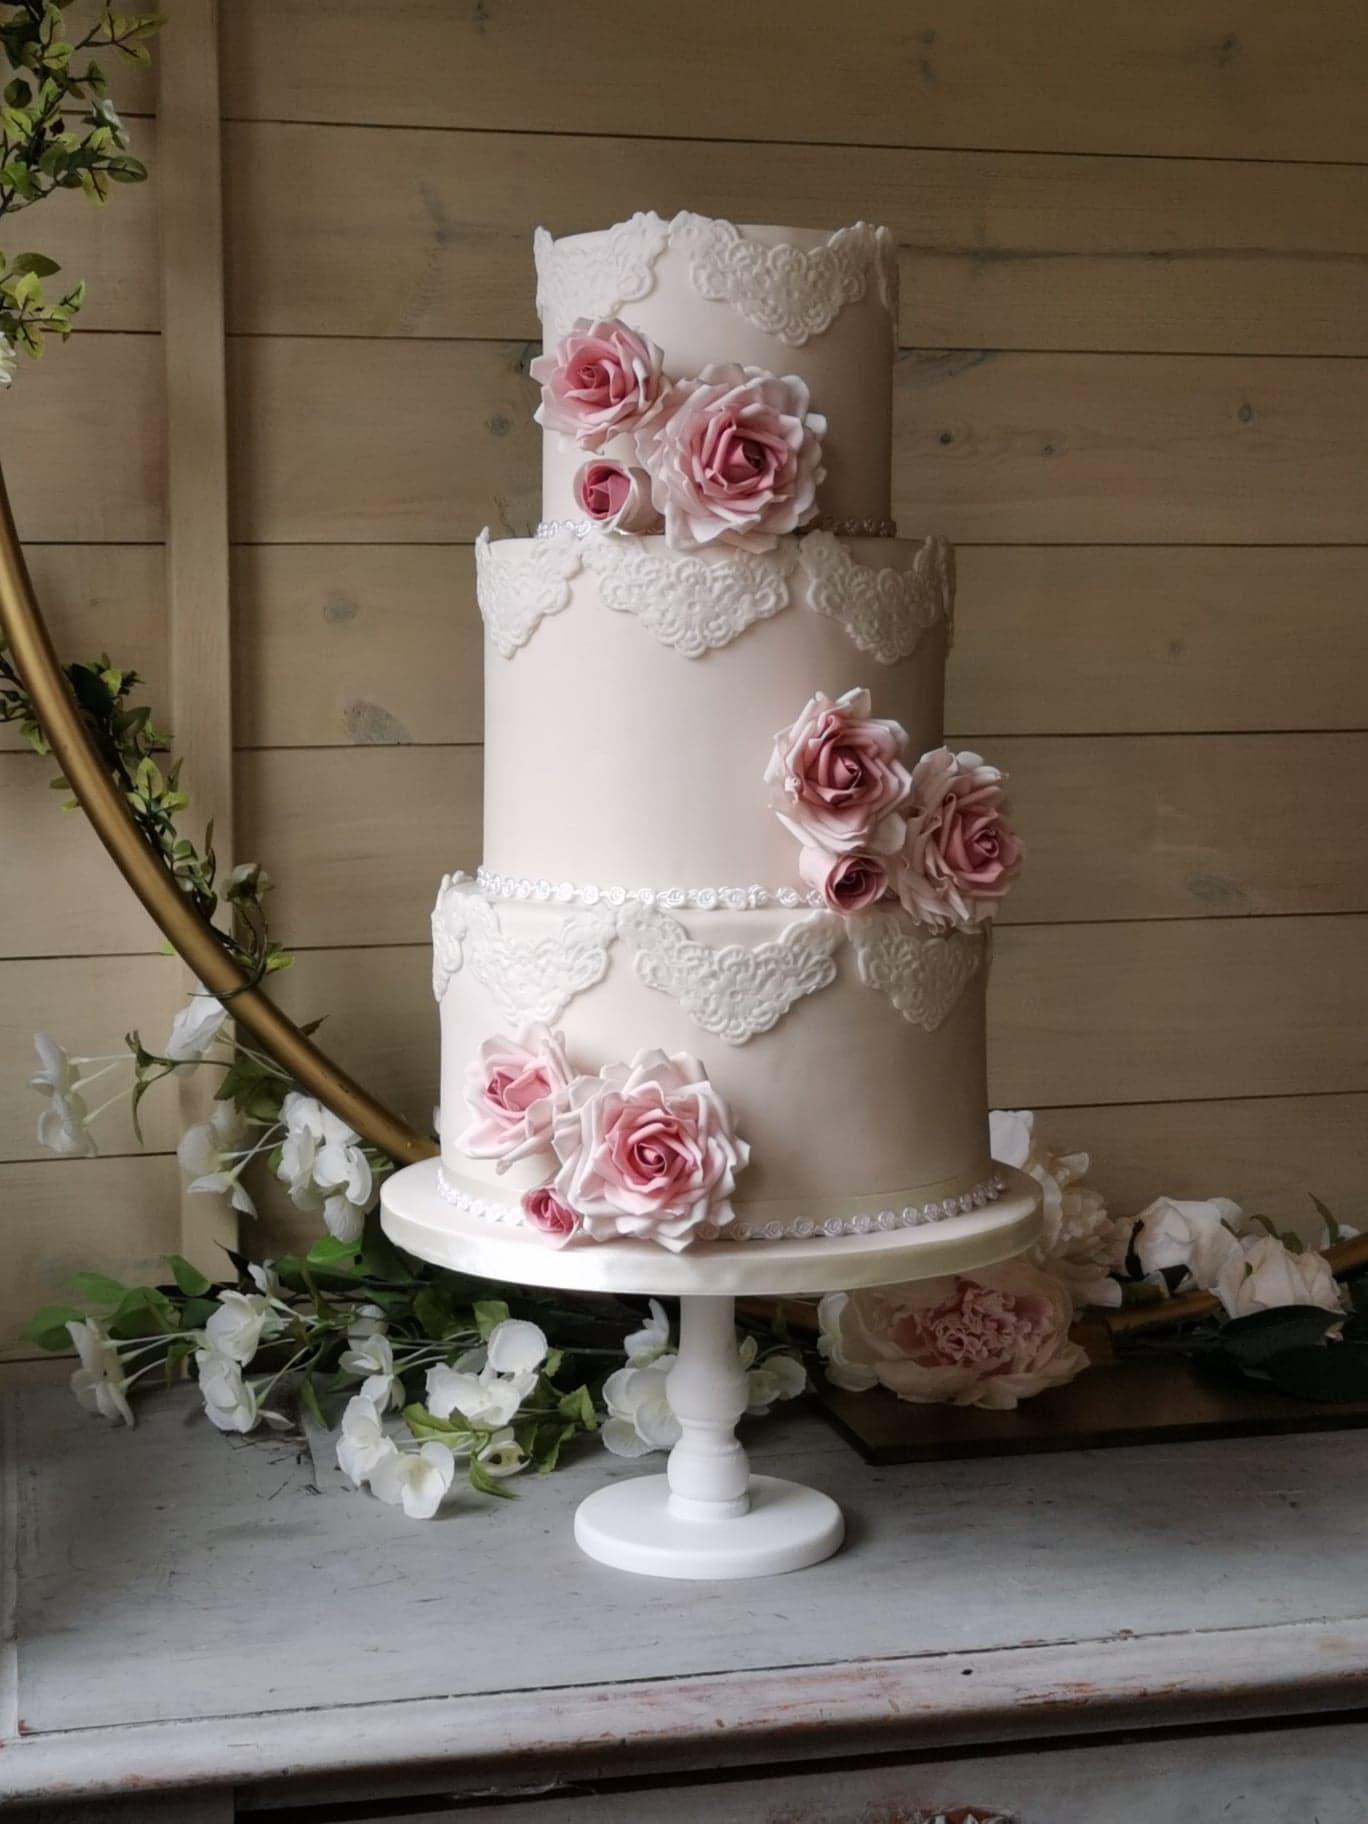 My Little Studio - Creative wedding cakes - individual wedding cakes - alternative wedding cakes 4